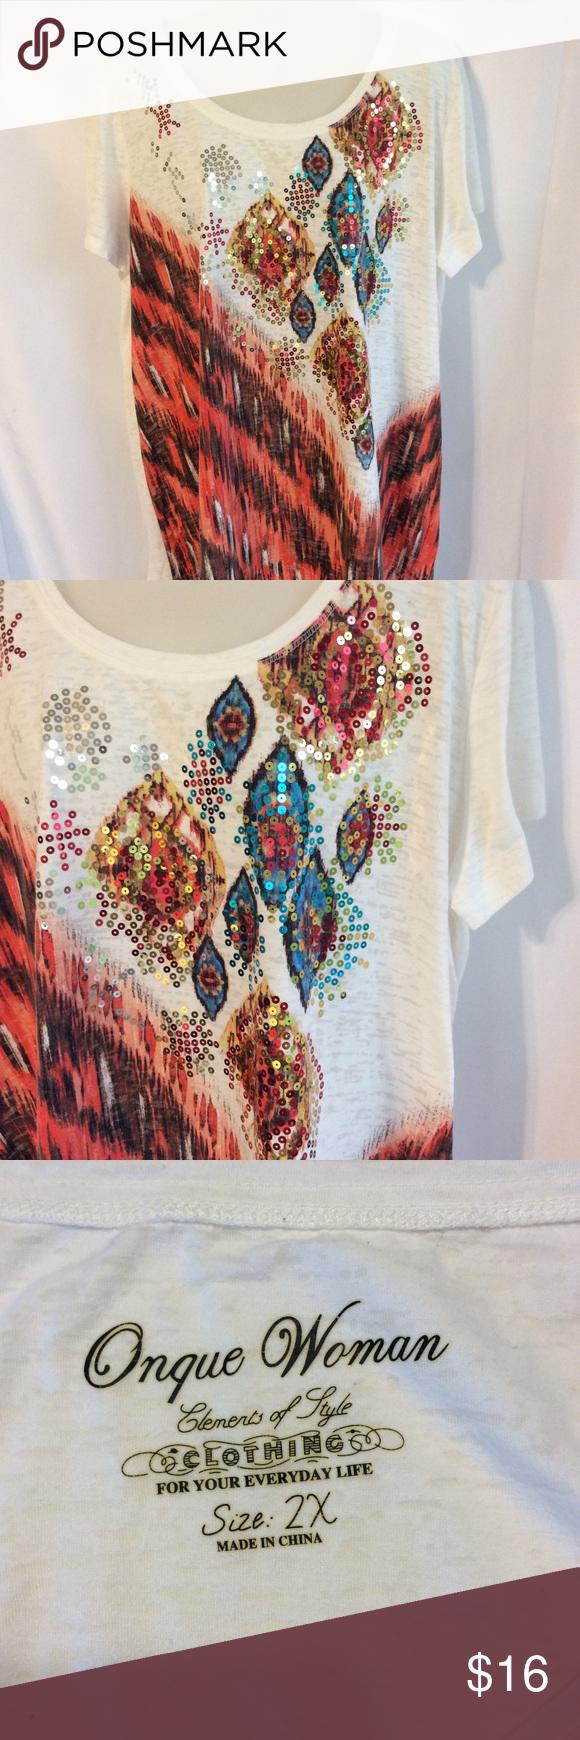 🧿Onque Woman Top   Clothes design